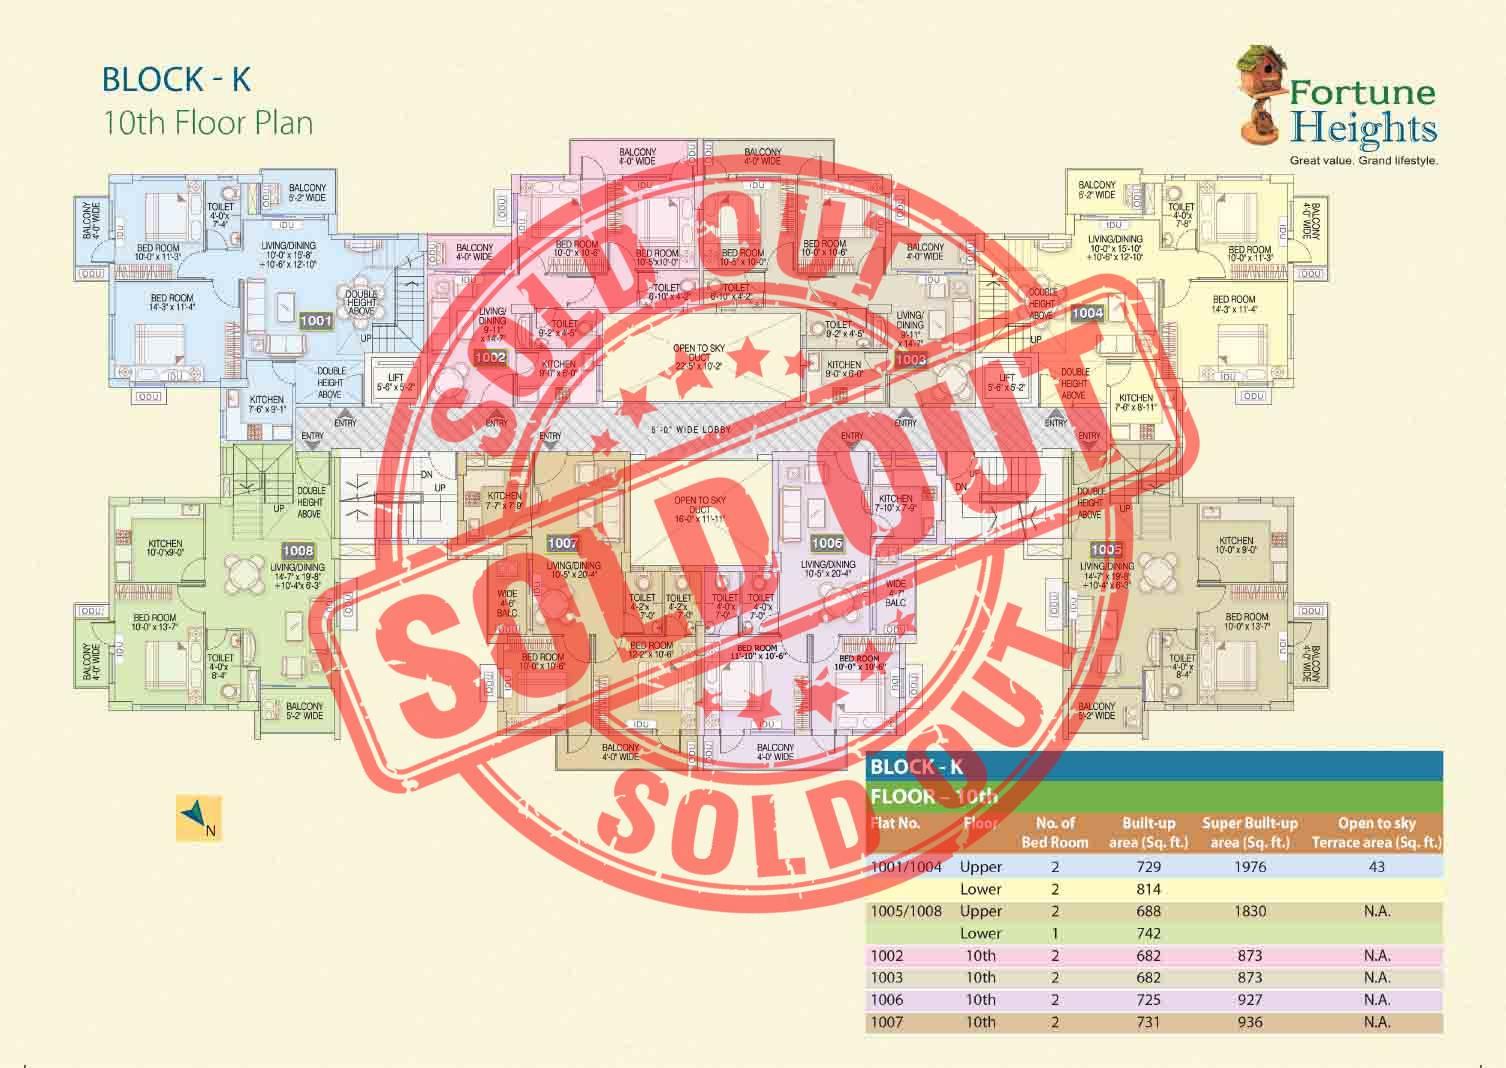 1629208009block-k-10th-floor-plan.jpg